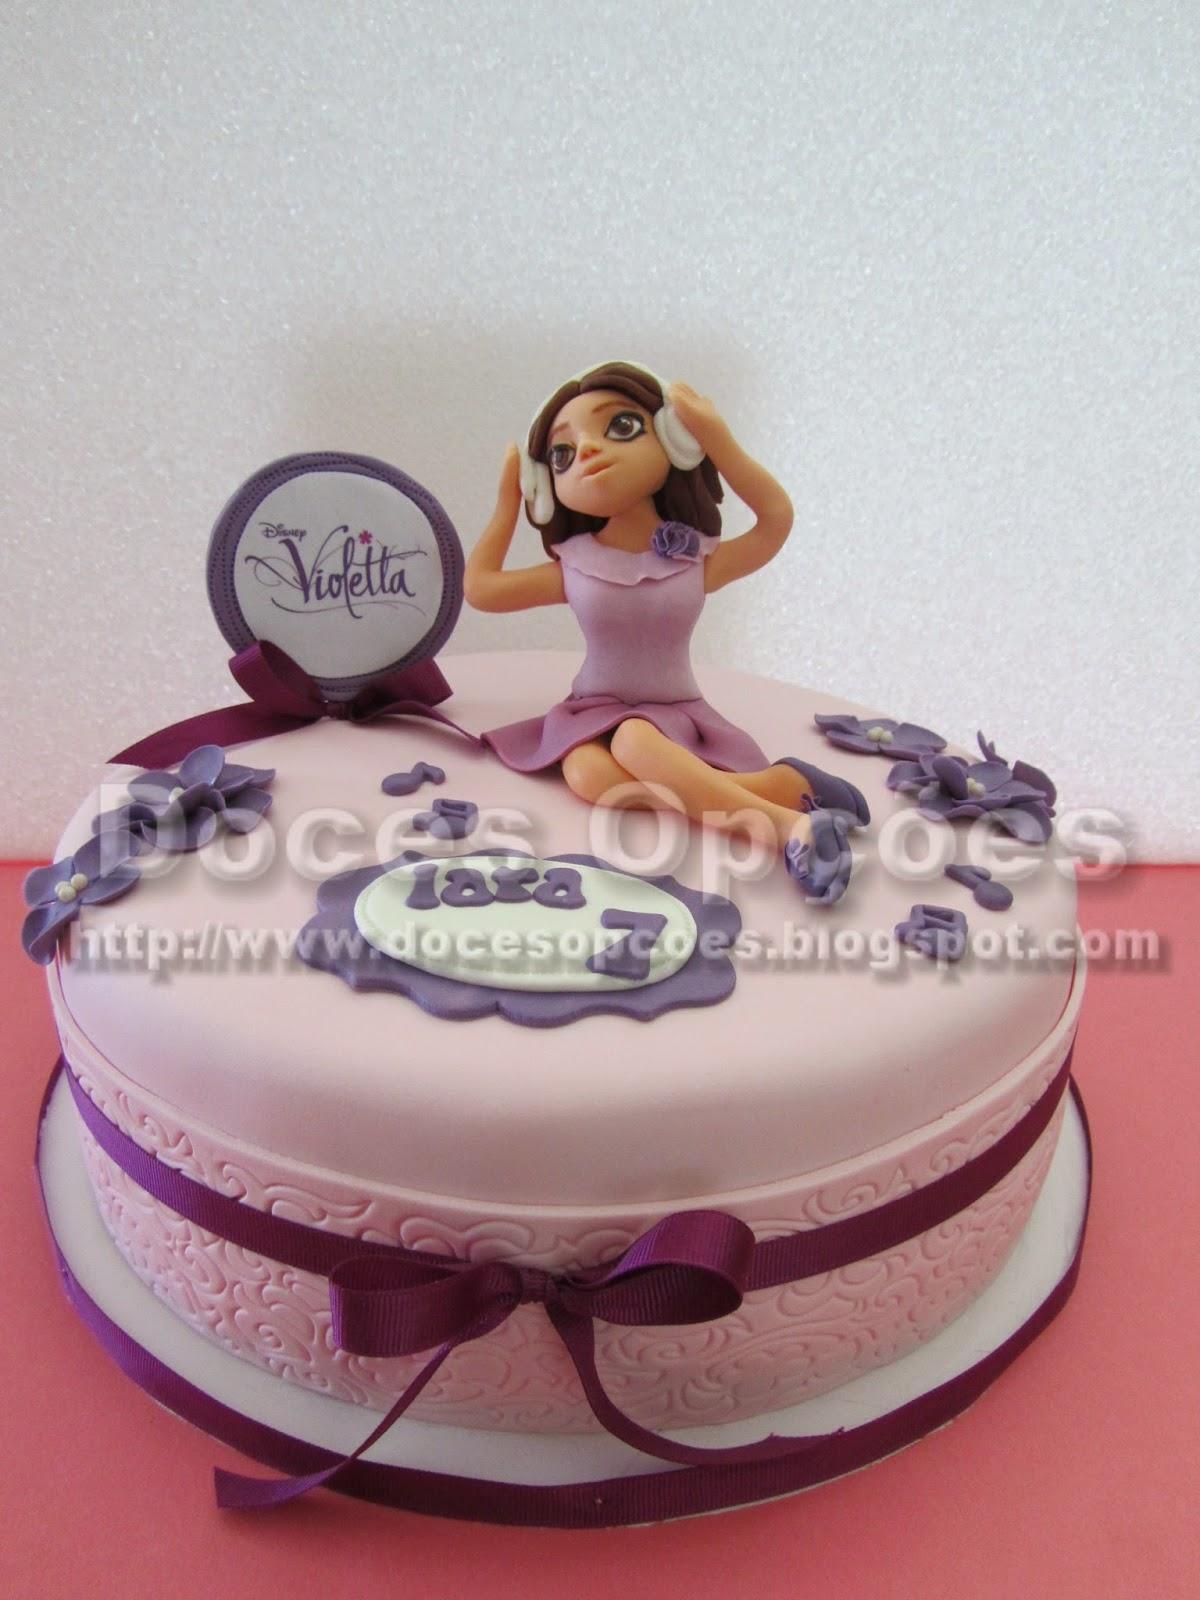 disney violetta cake